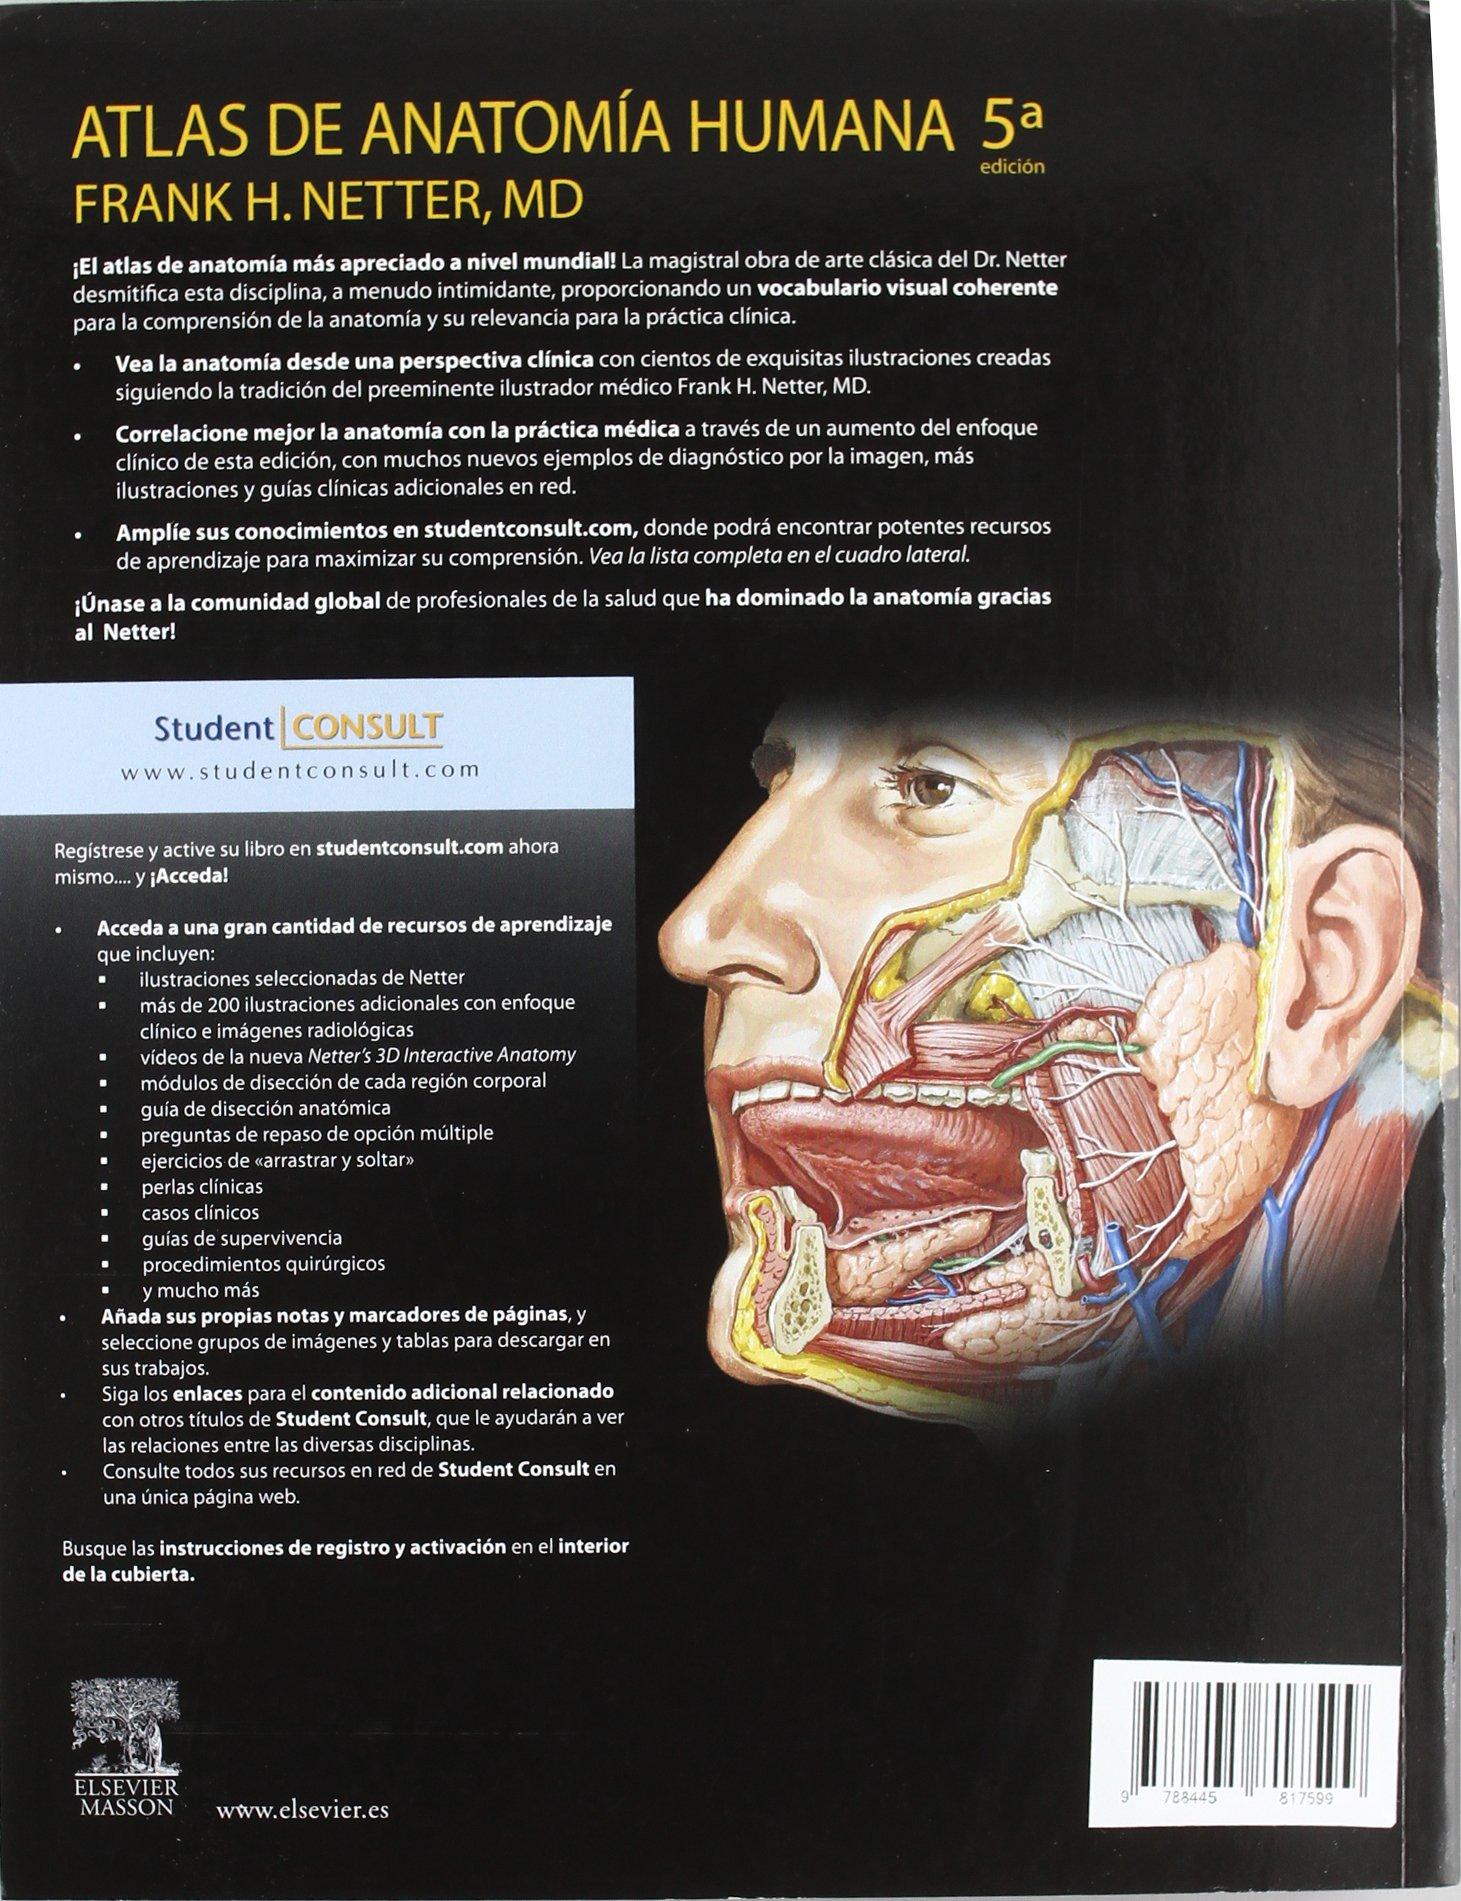 Atlas de anatomia humana [Nov 11, 2004] Netter, Frank Henry: FRANK ...